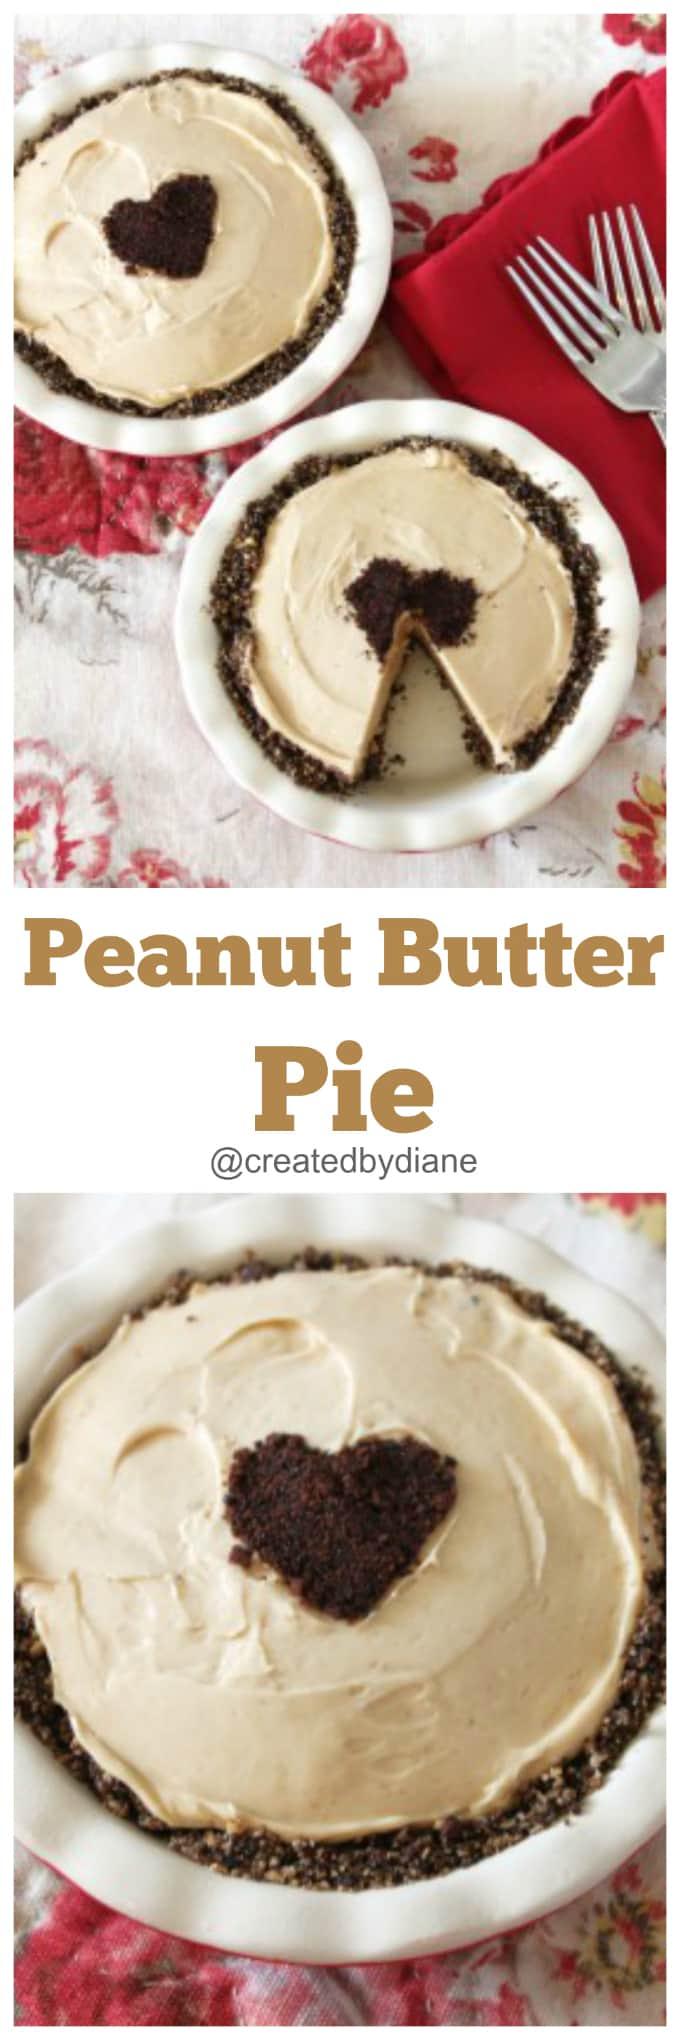 peanut butter pie @createdbydiane